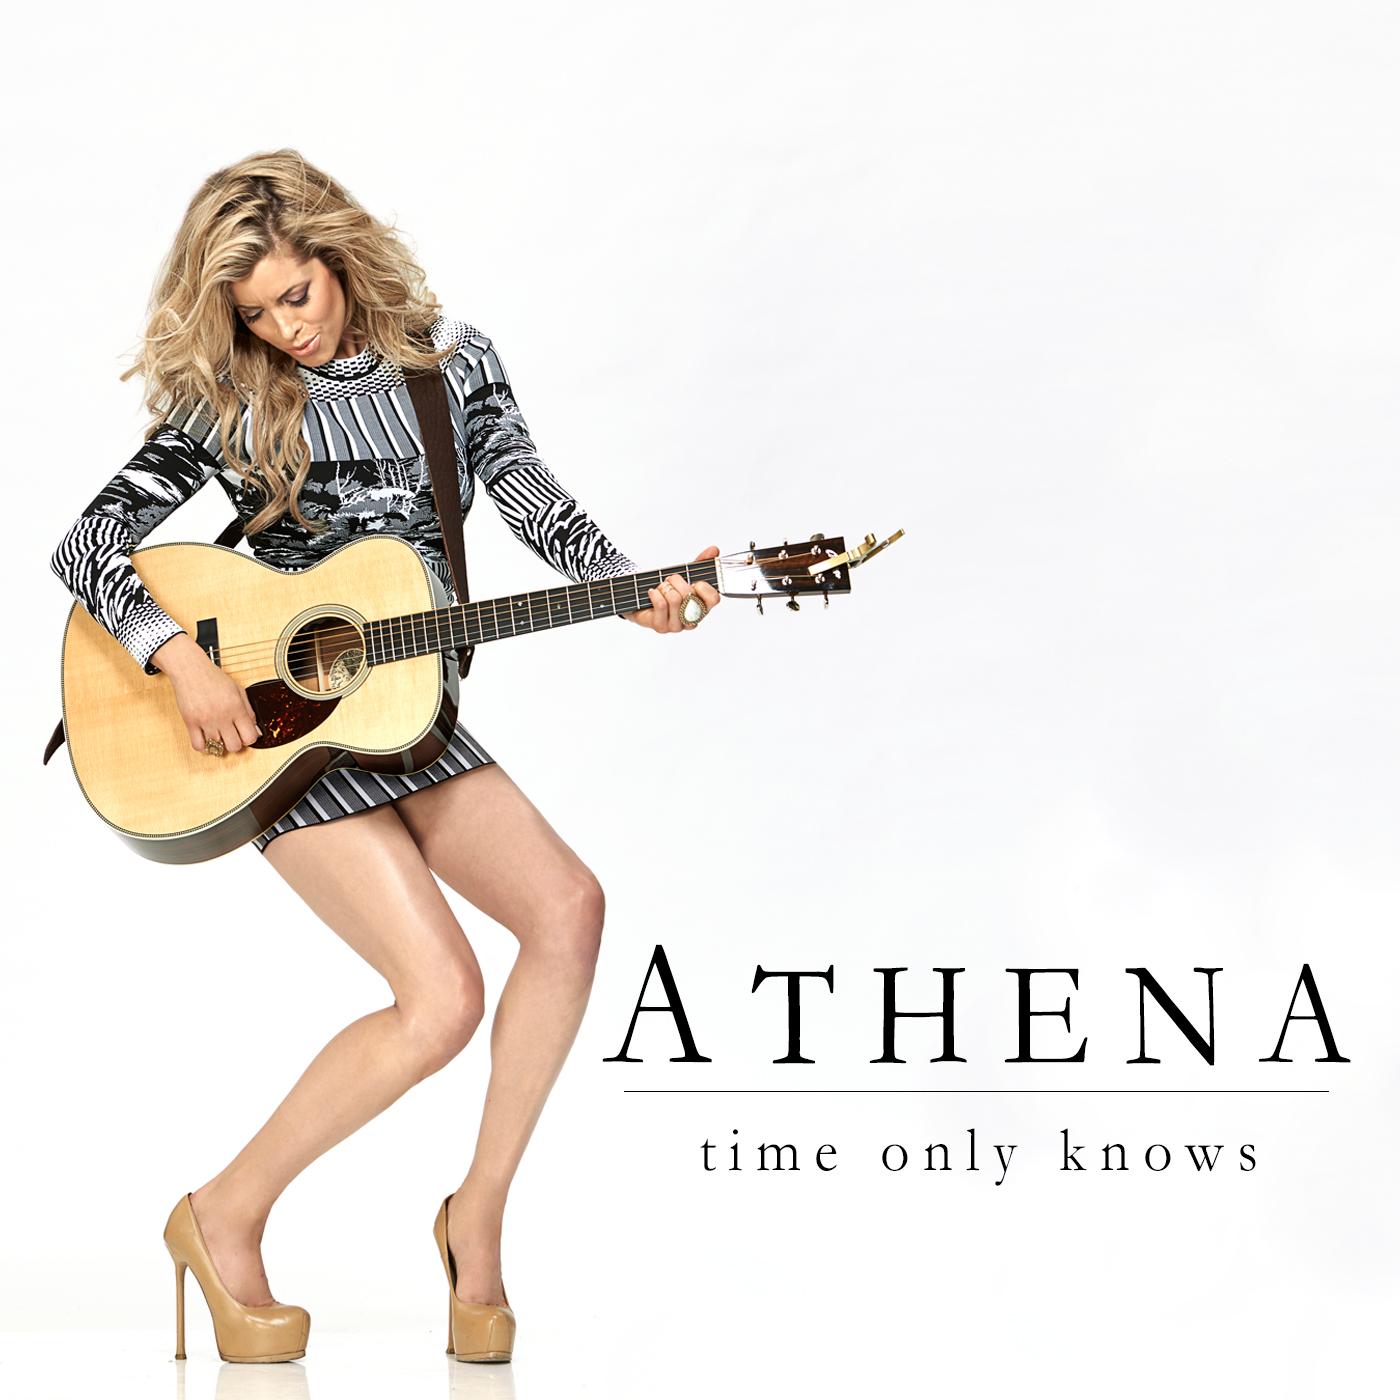 SOUTHERN ROCK SINGER ATHENA